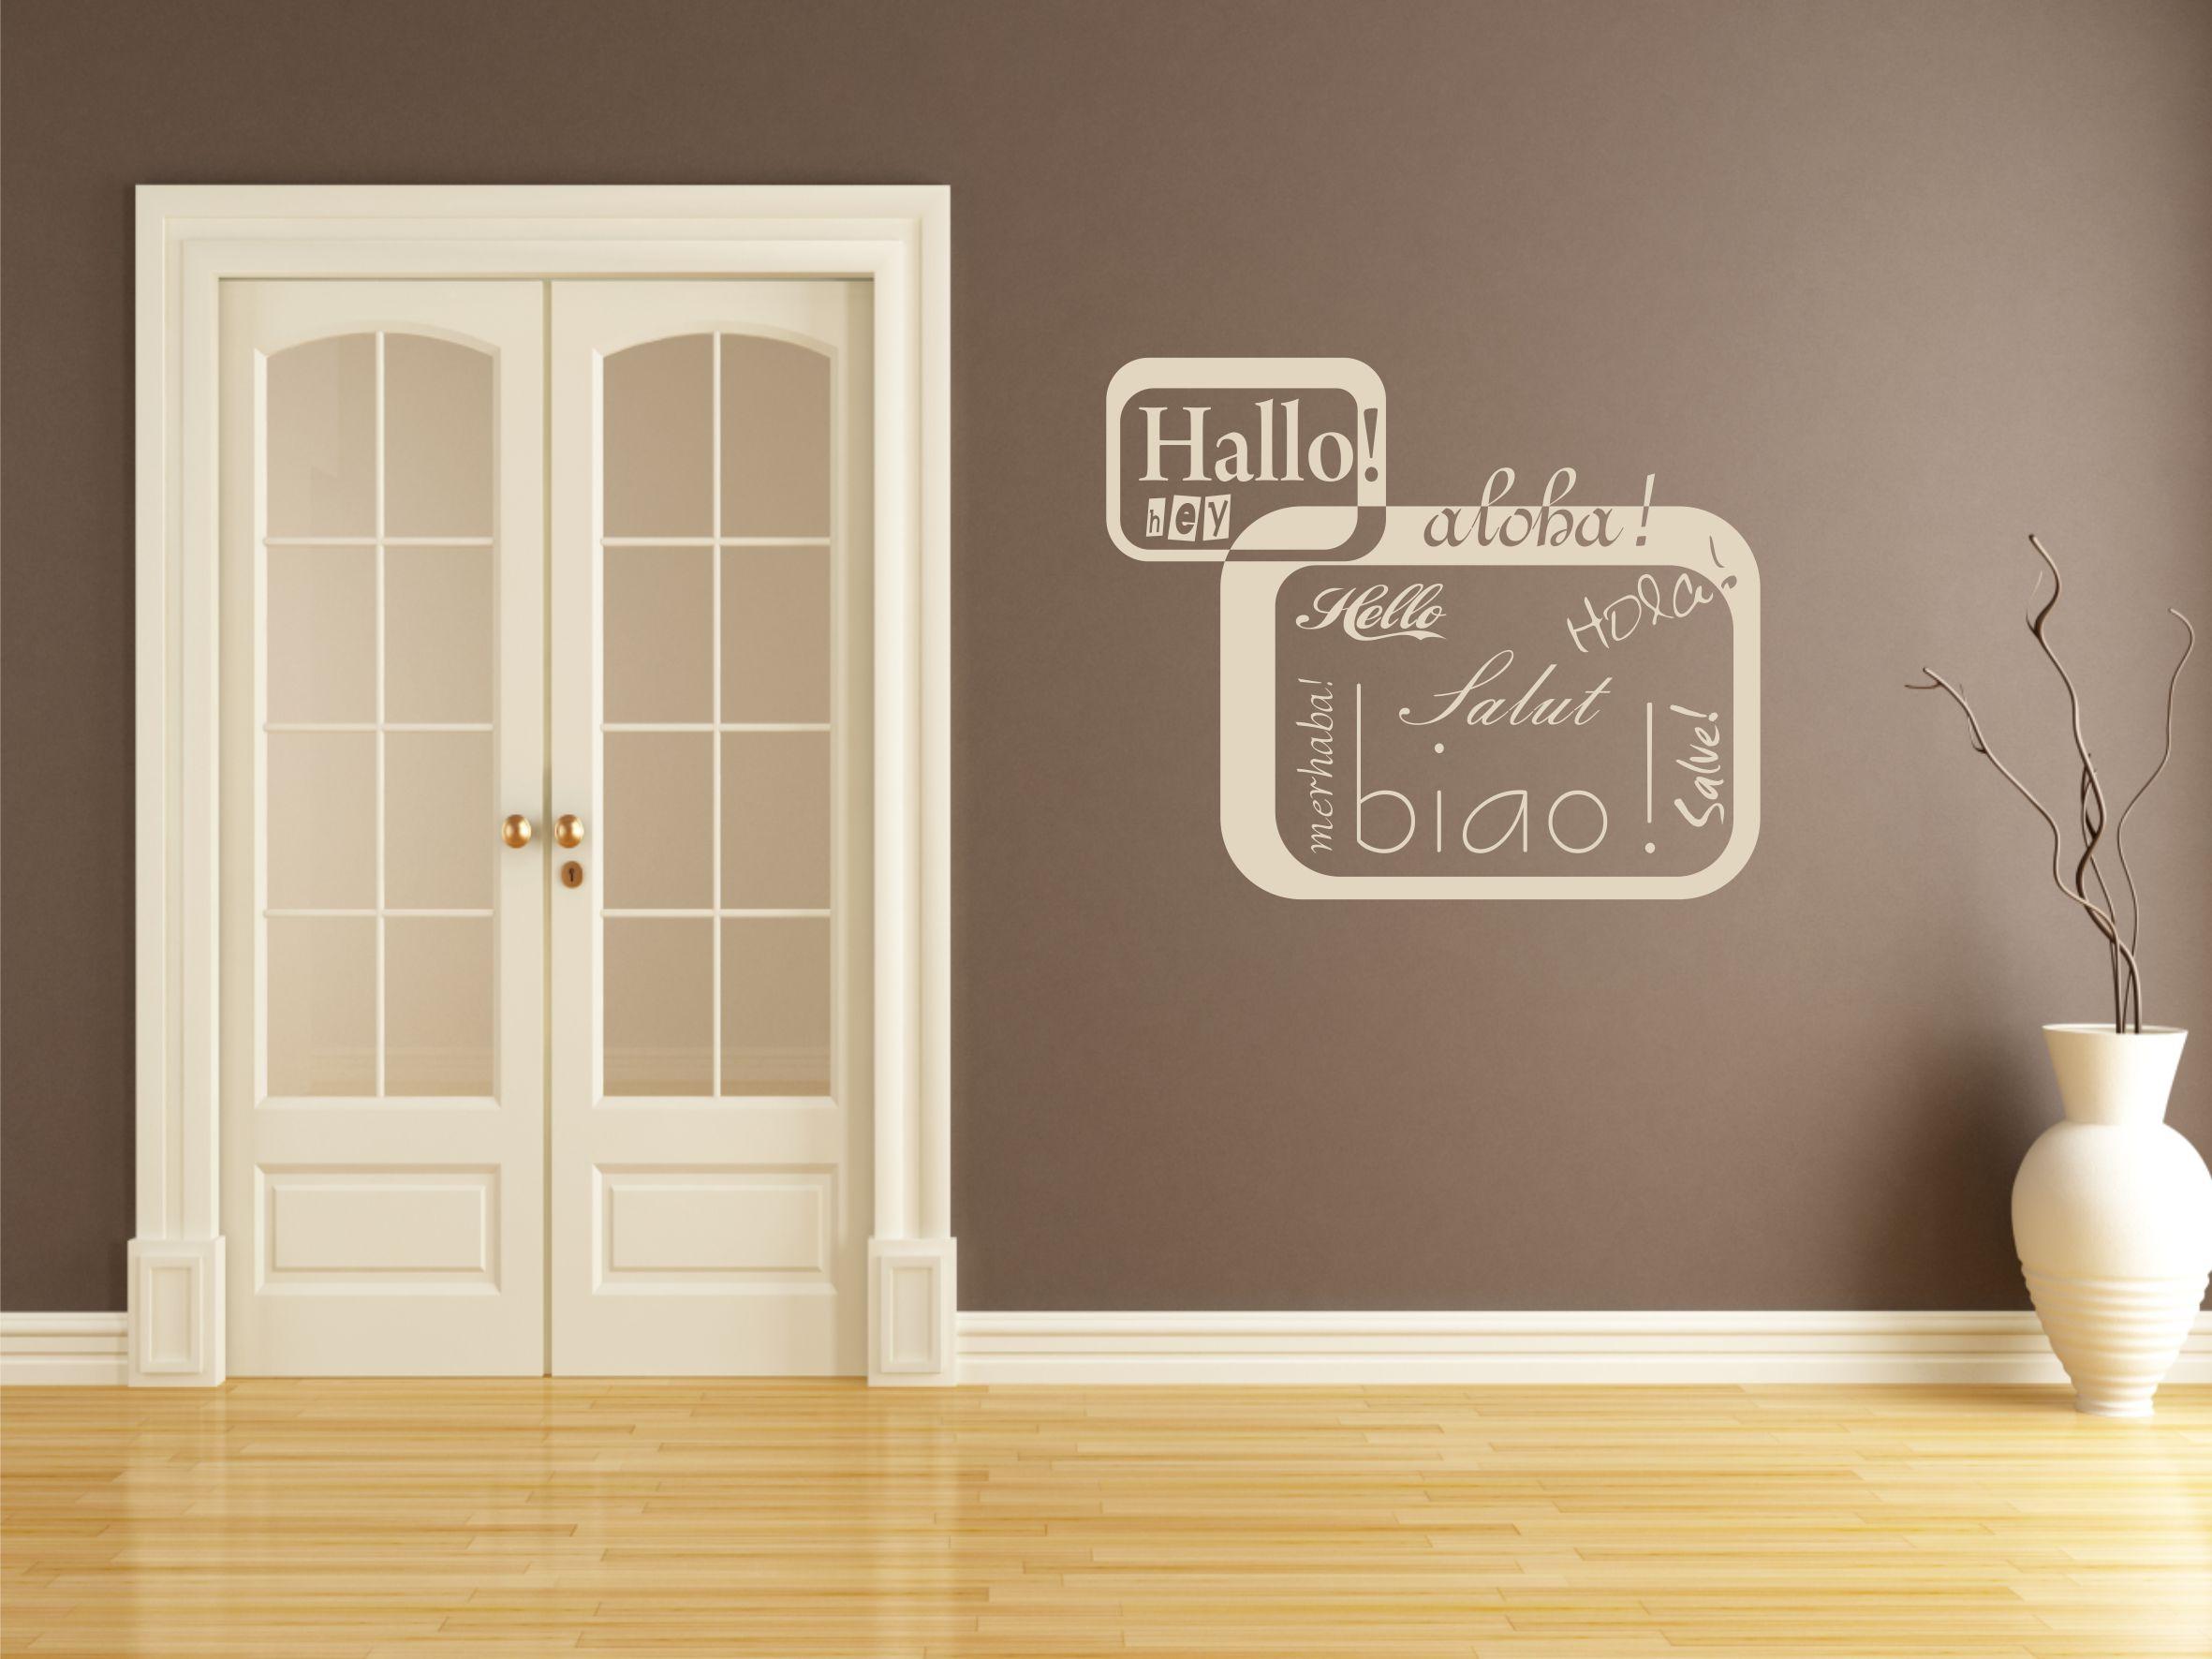 feinputz aufbringen badezimmer verputzen bilder feinputz badezimmer beautiful wand verputzen. Black Bedroom Furniture Sets. Home Design Ideas